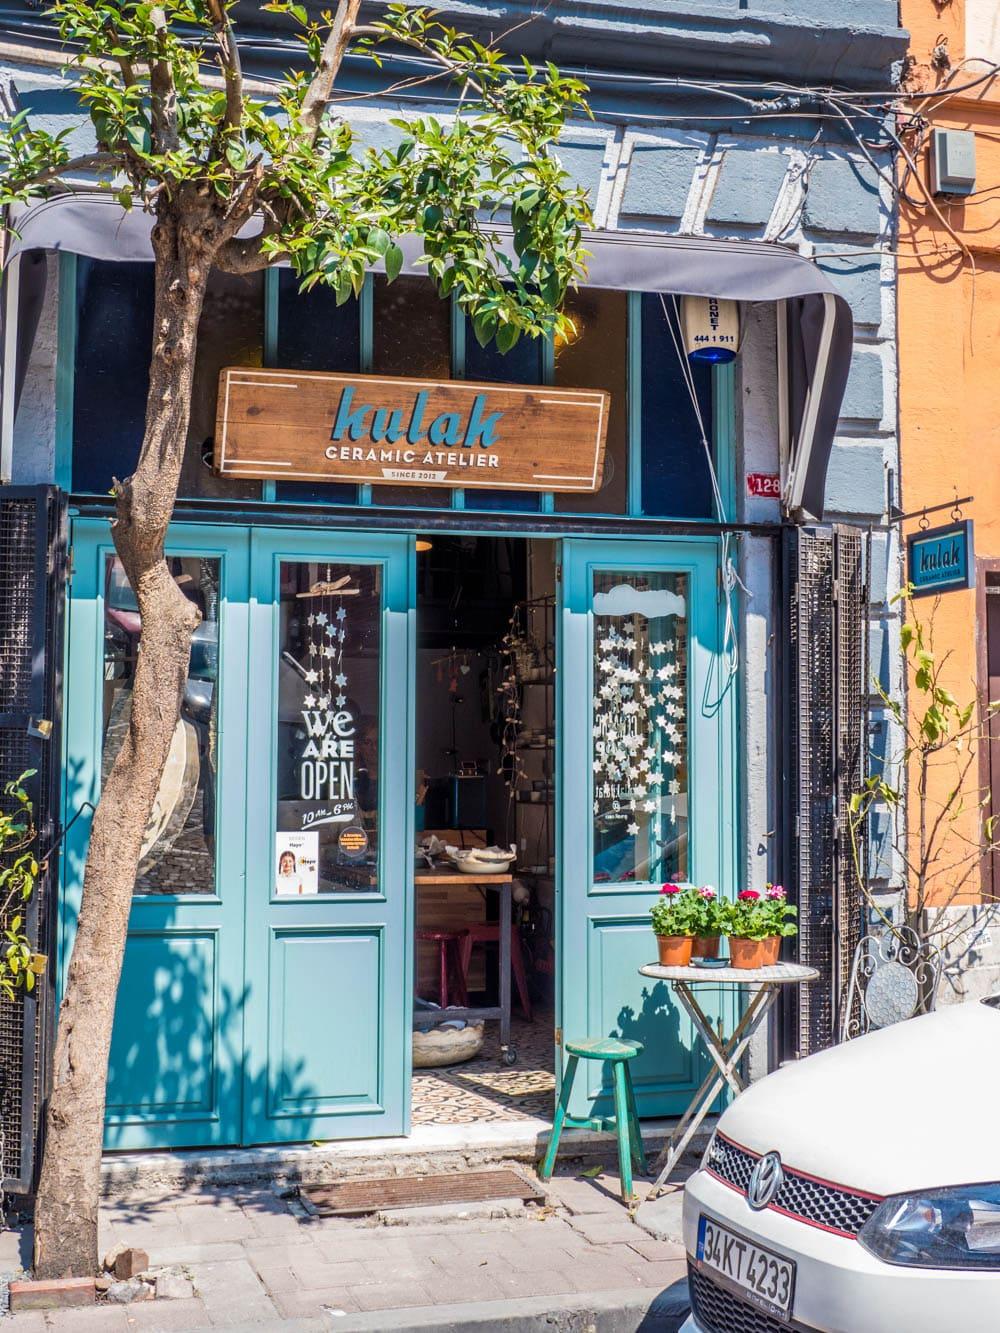 Keramisk verksted i Balat, Istanbul